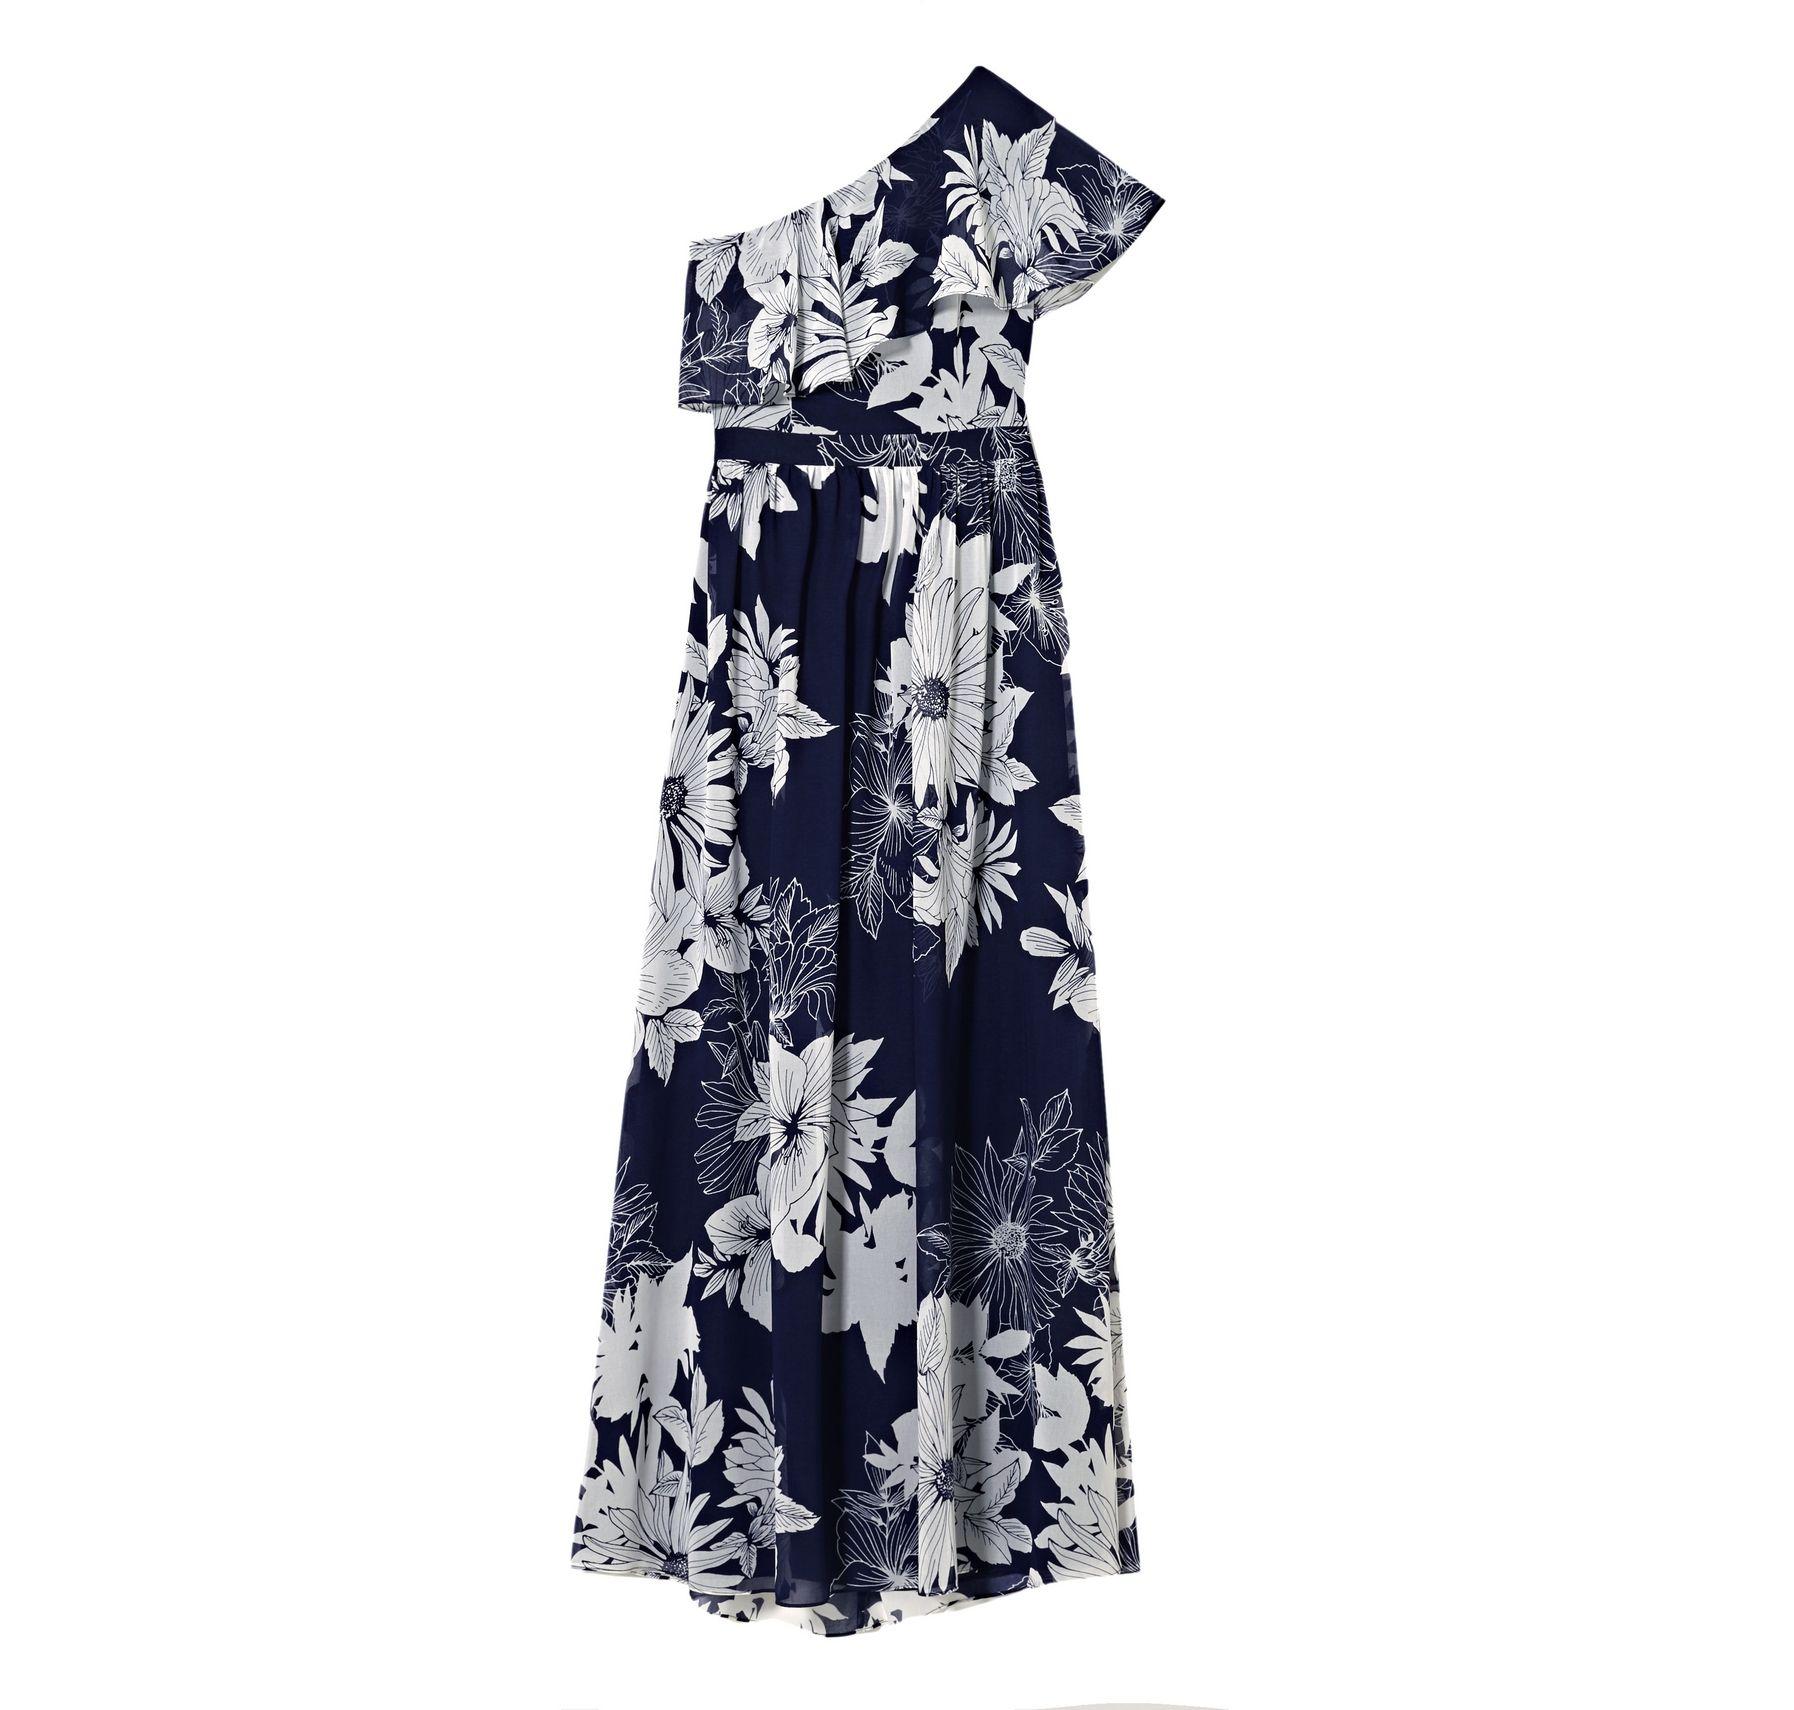 Vince Camuto One-shoulder Floral-print Maxi Dress - Vince Camuto